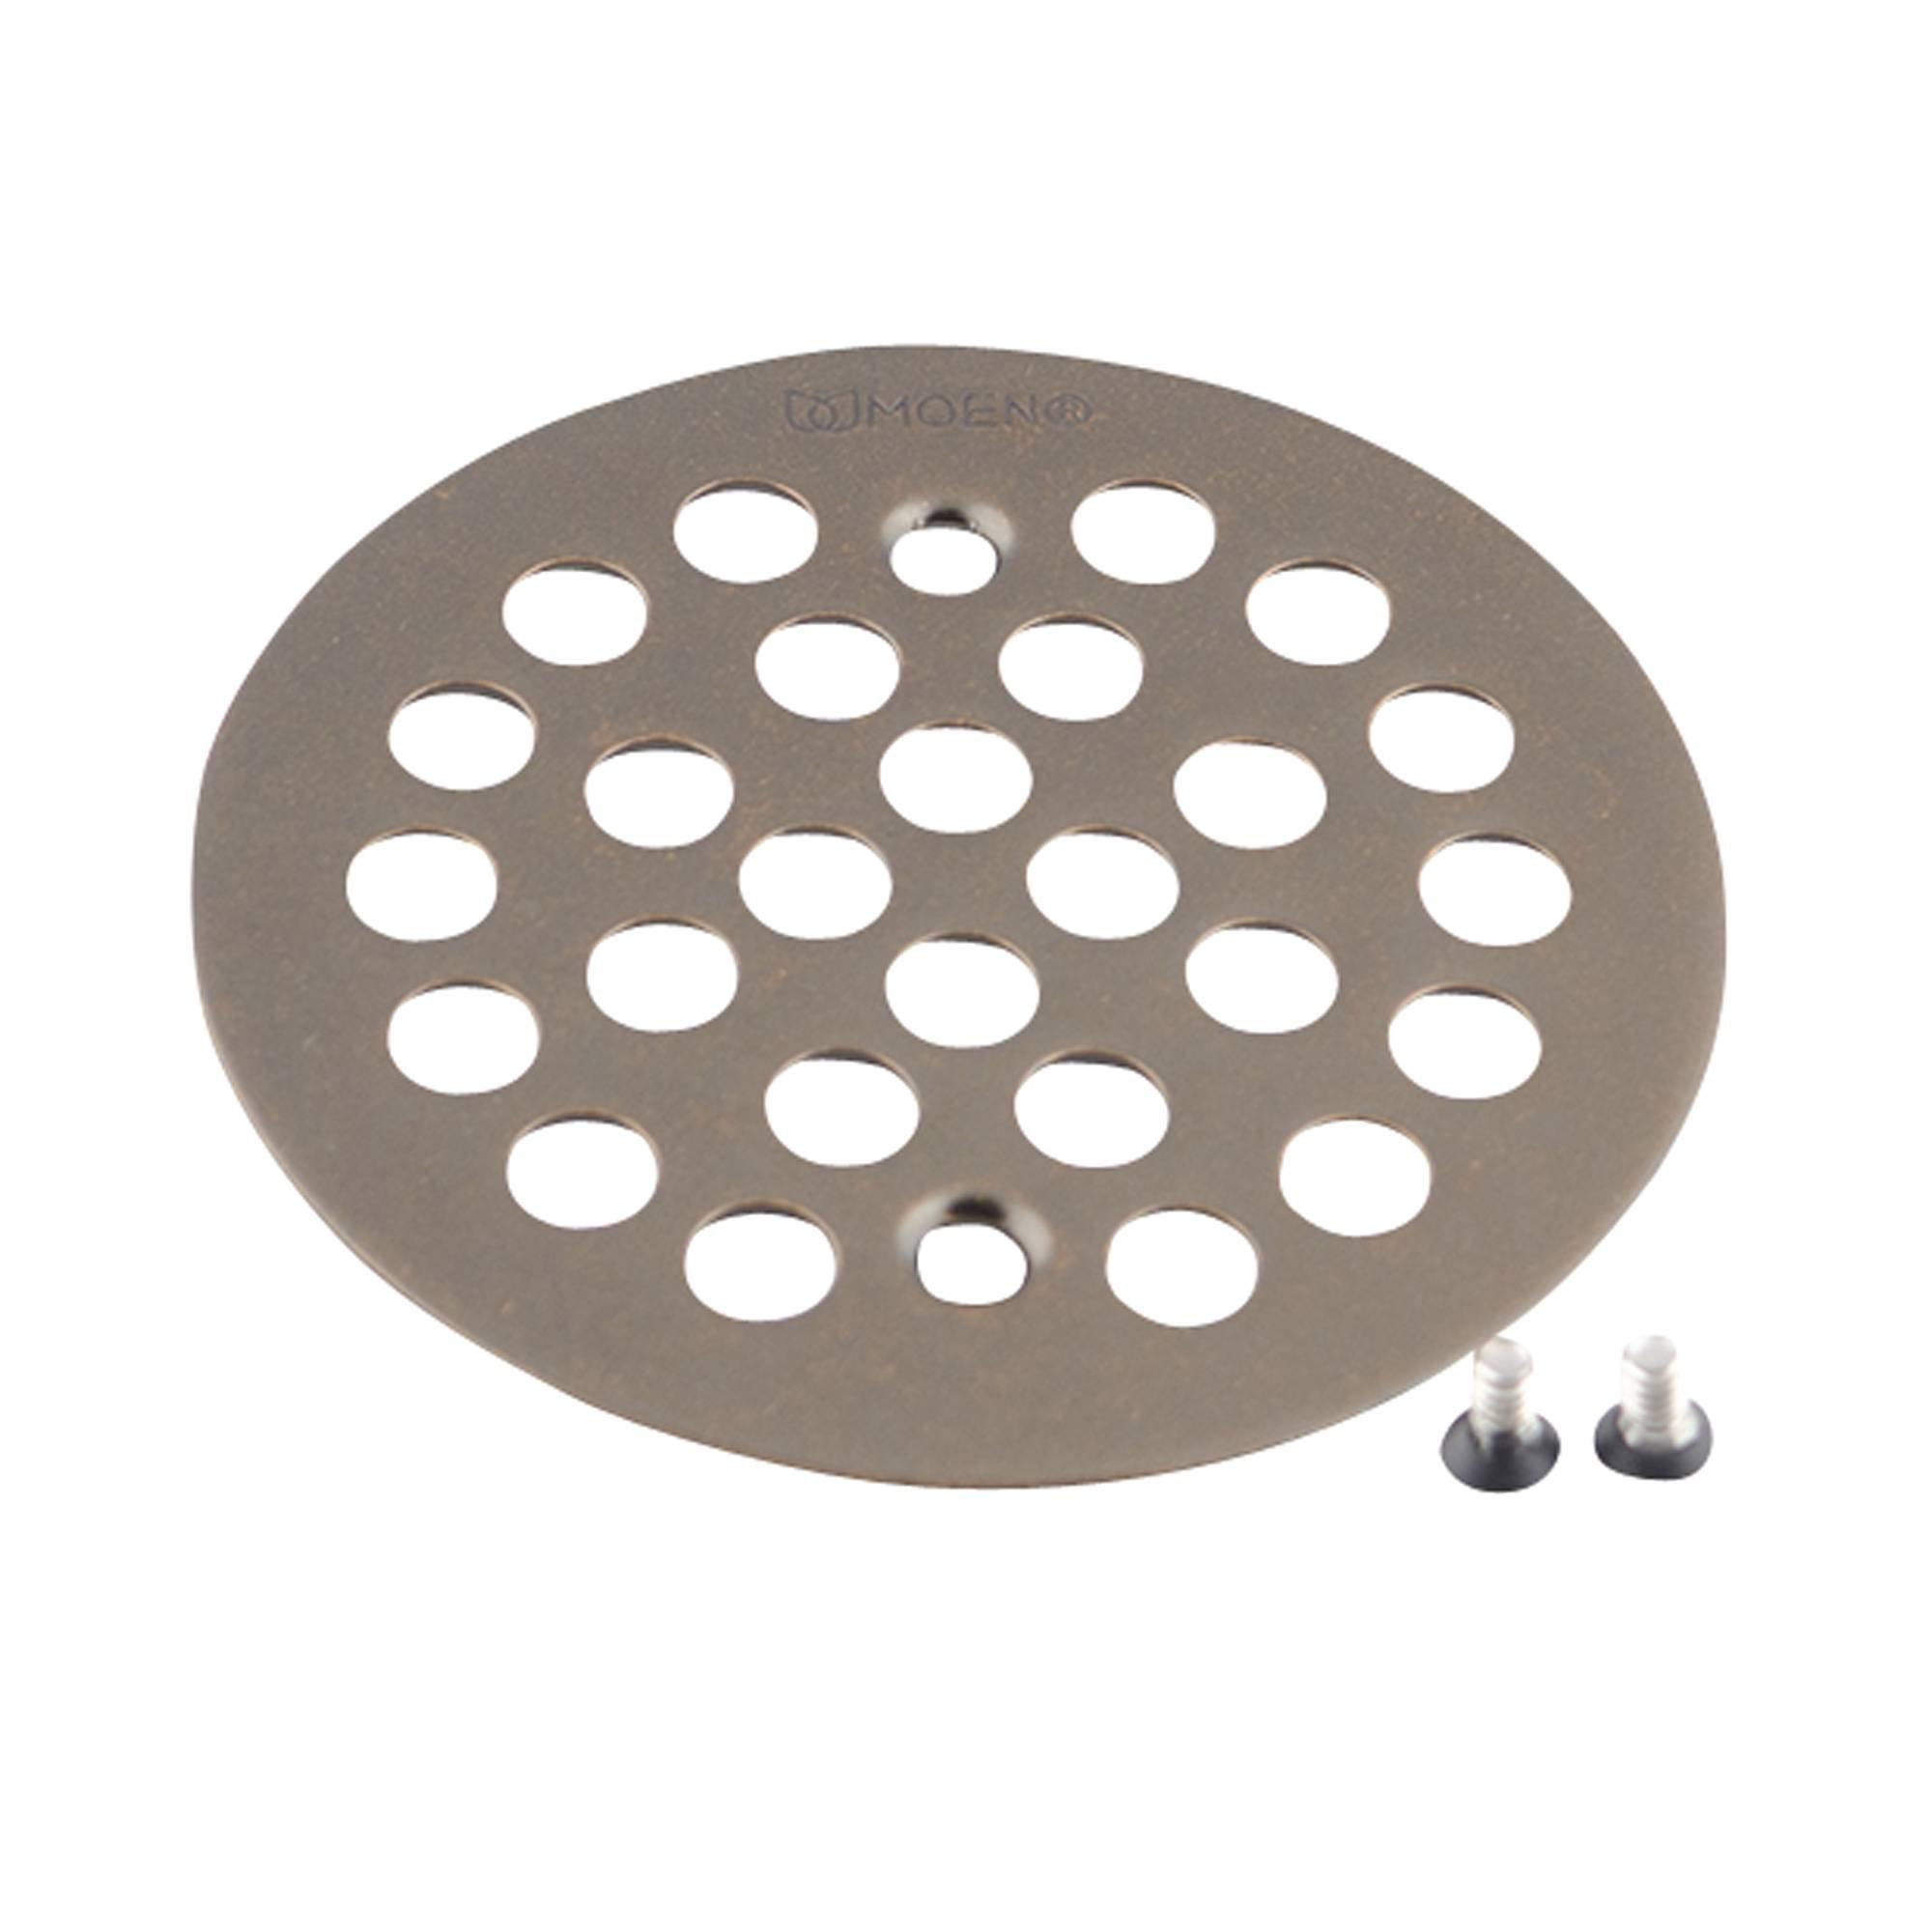 Moen 101664ORB Kingsley 4-1/4-Inch Screw-In Shower Strainer, Oil Rubbed Bronze